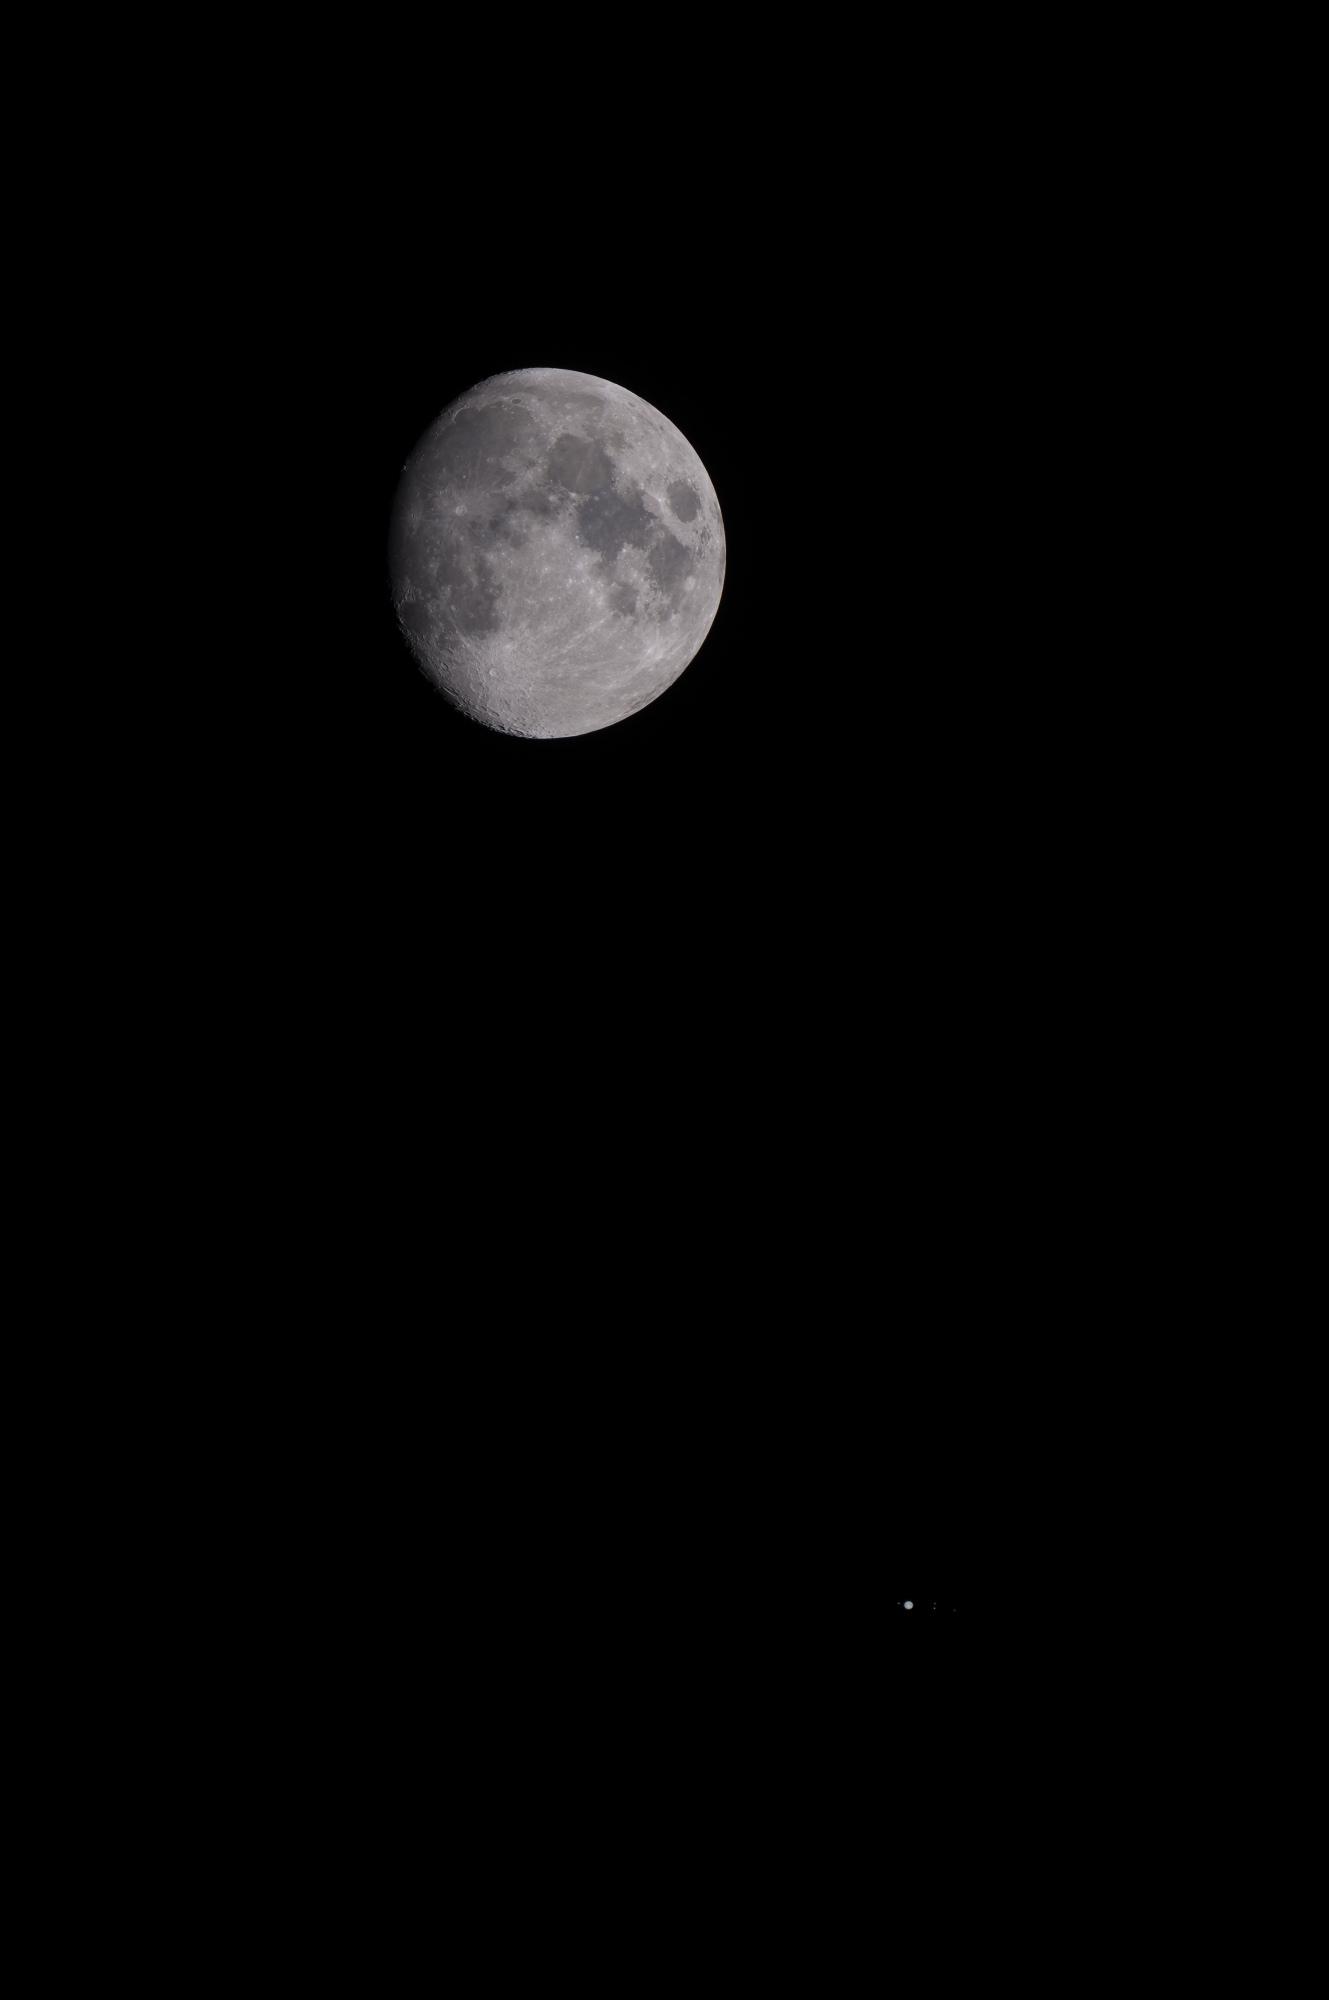 Lune-jupi-072019.thumb.jpg.fae2071dc435d6385ed8838696cd7349.jpg